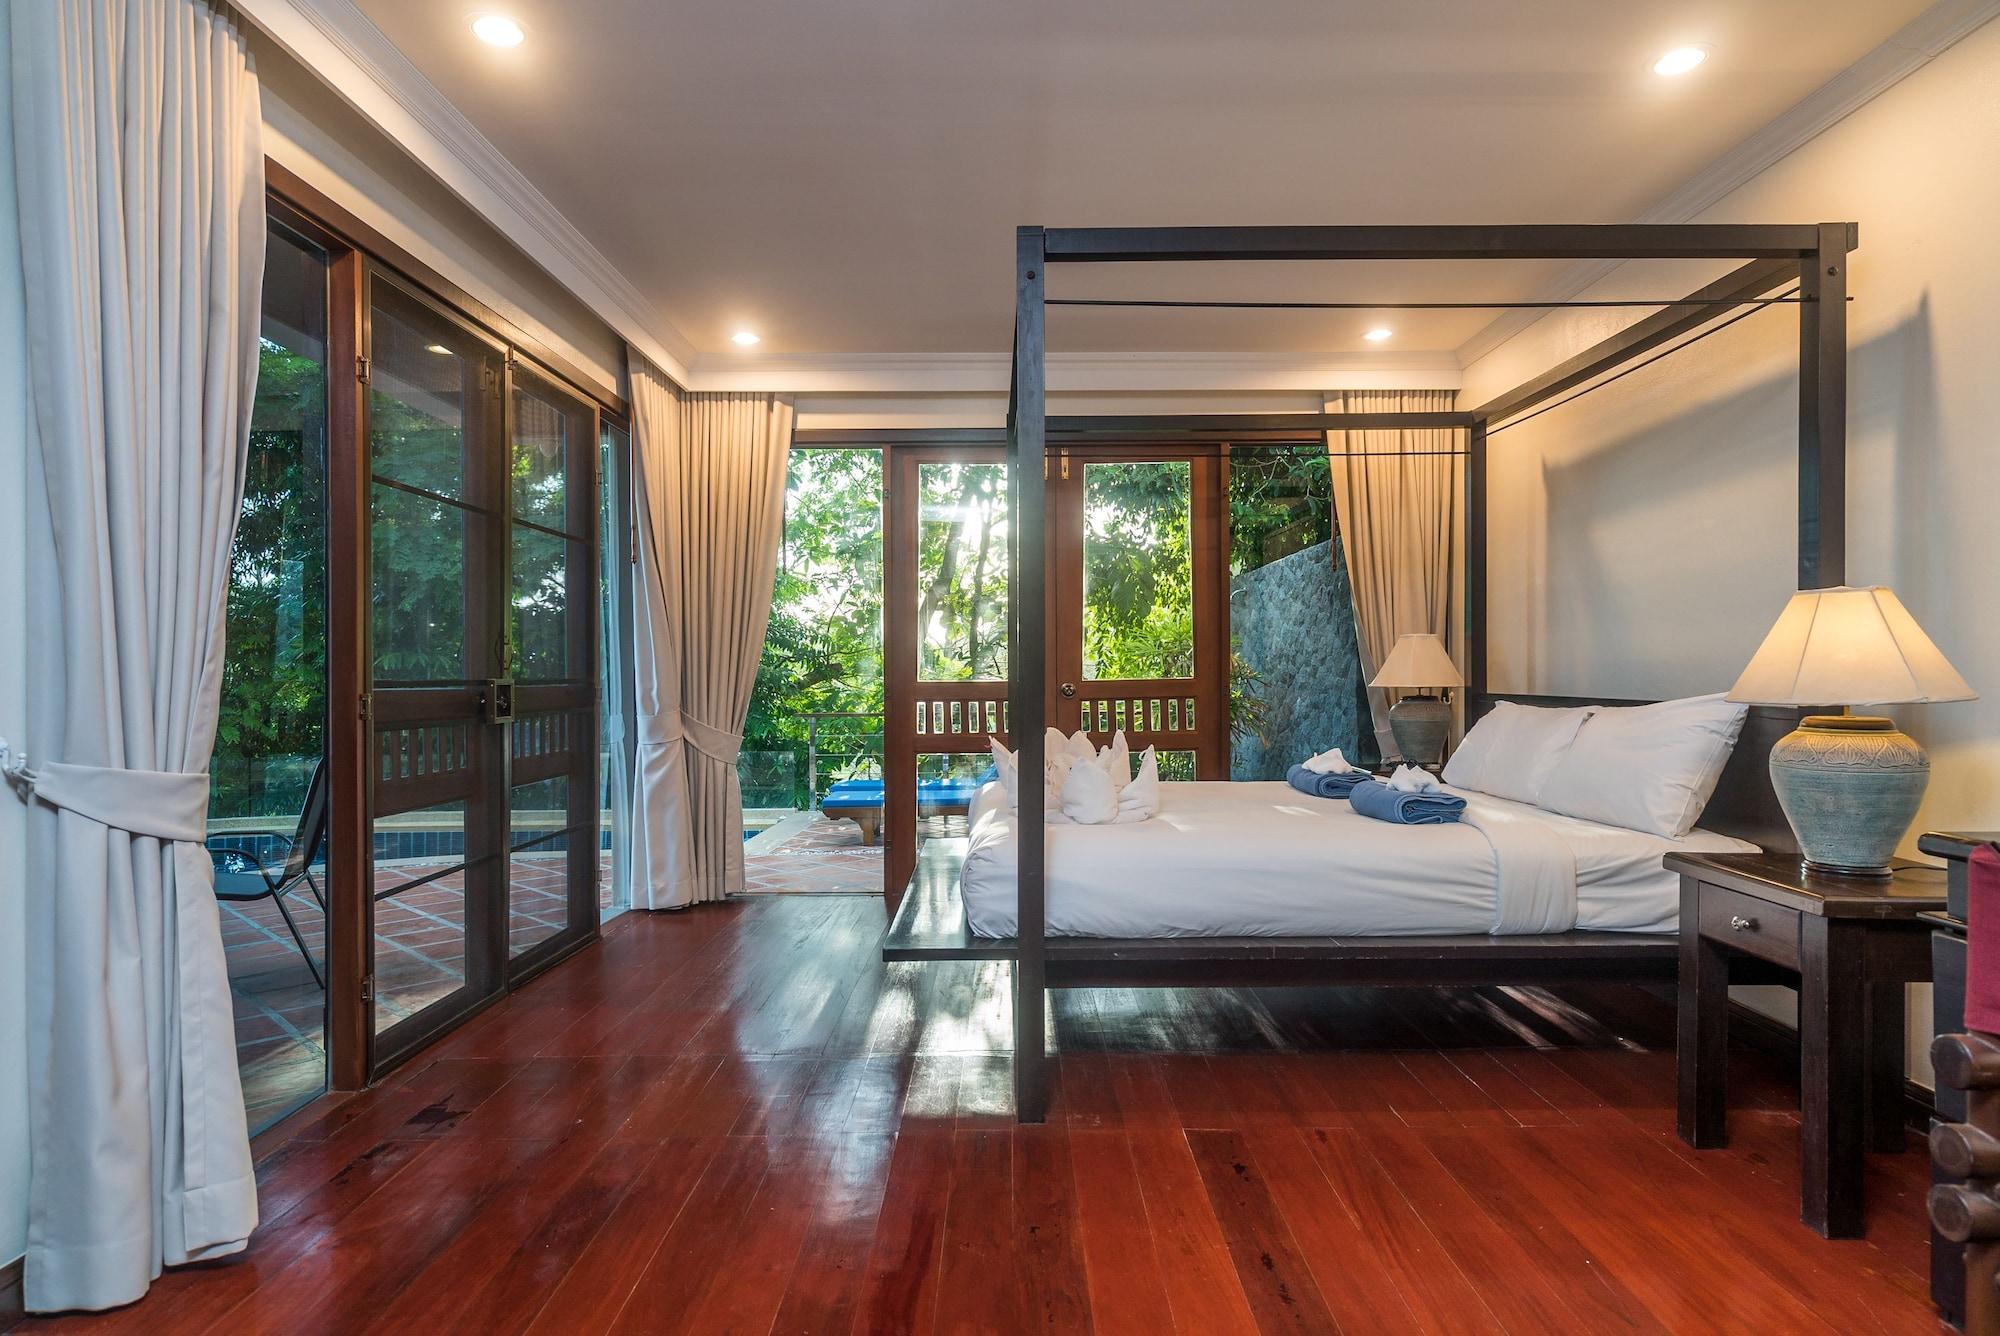 Nakatani Villas By Lofty, Pulau Phuket